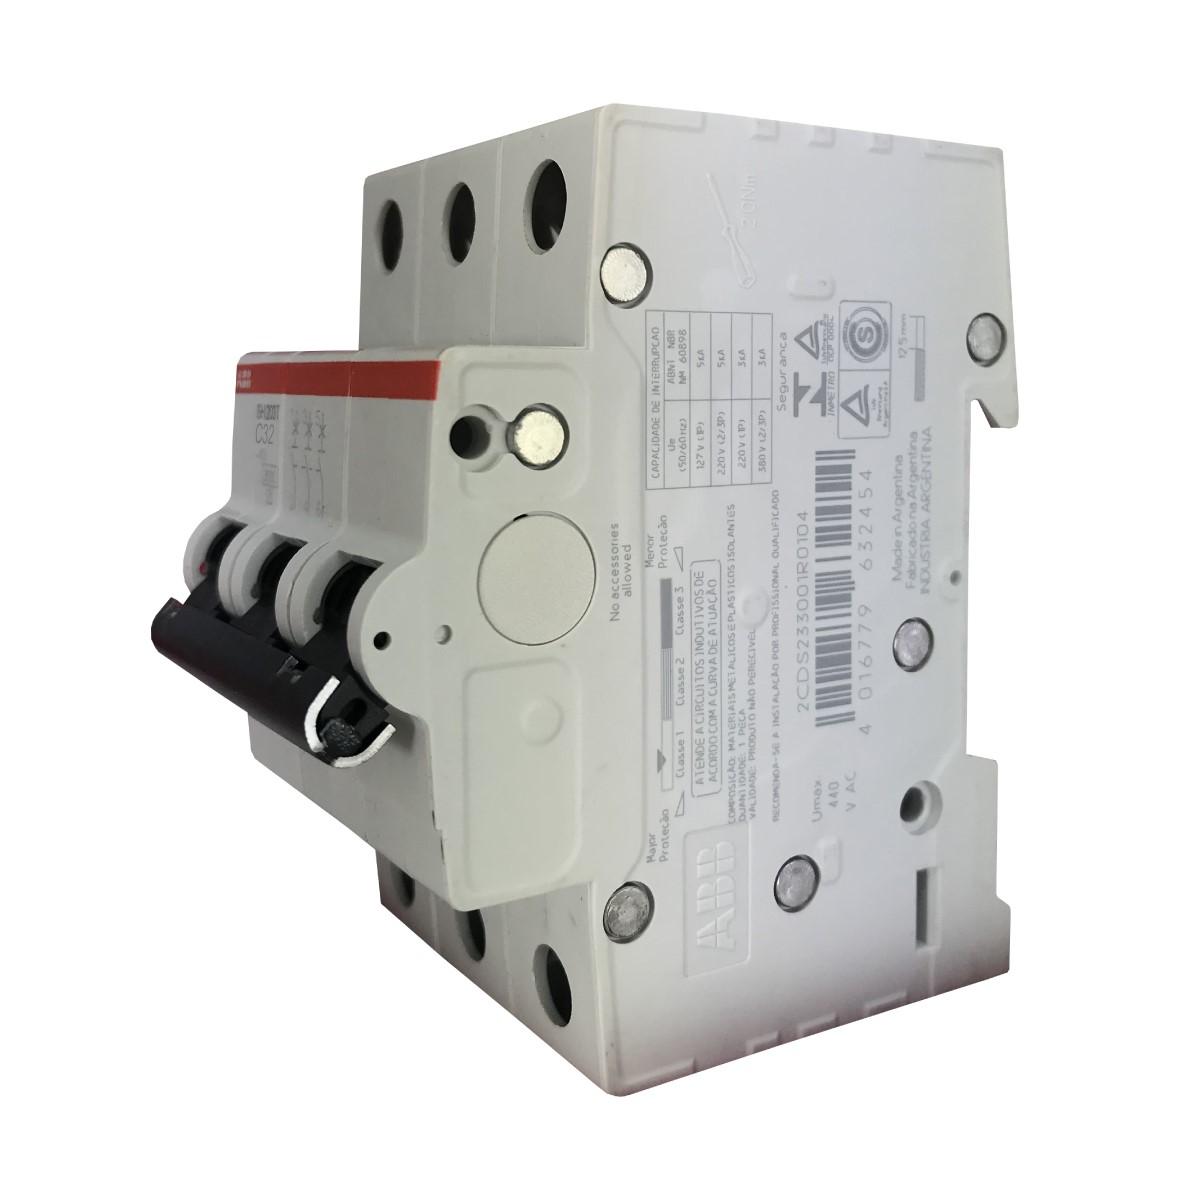 SH203 T-C32_ABB_PeR Automação Industrial